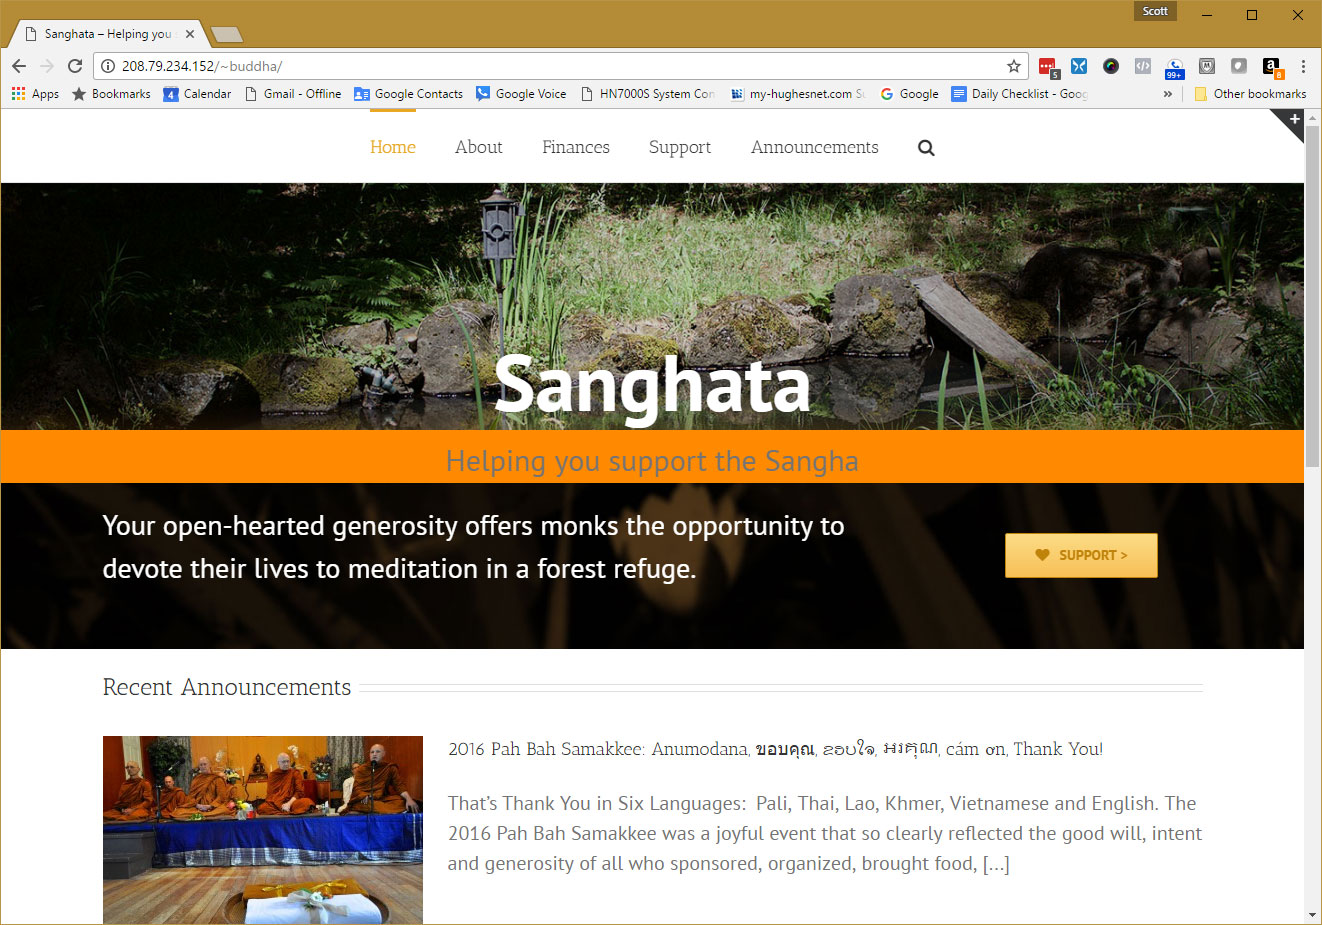 sanghata